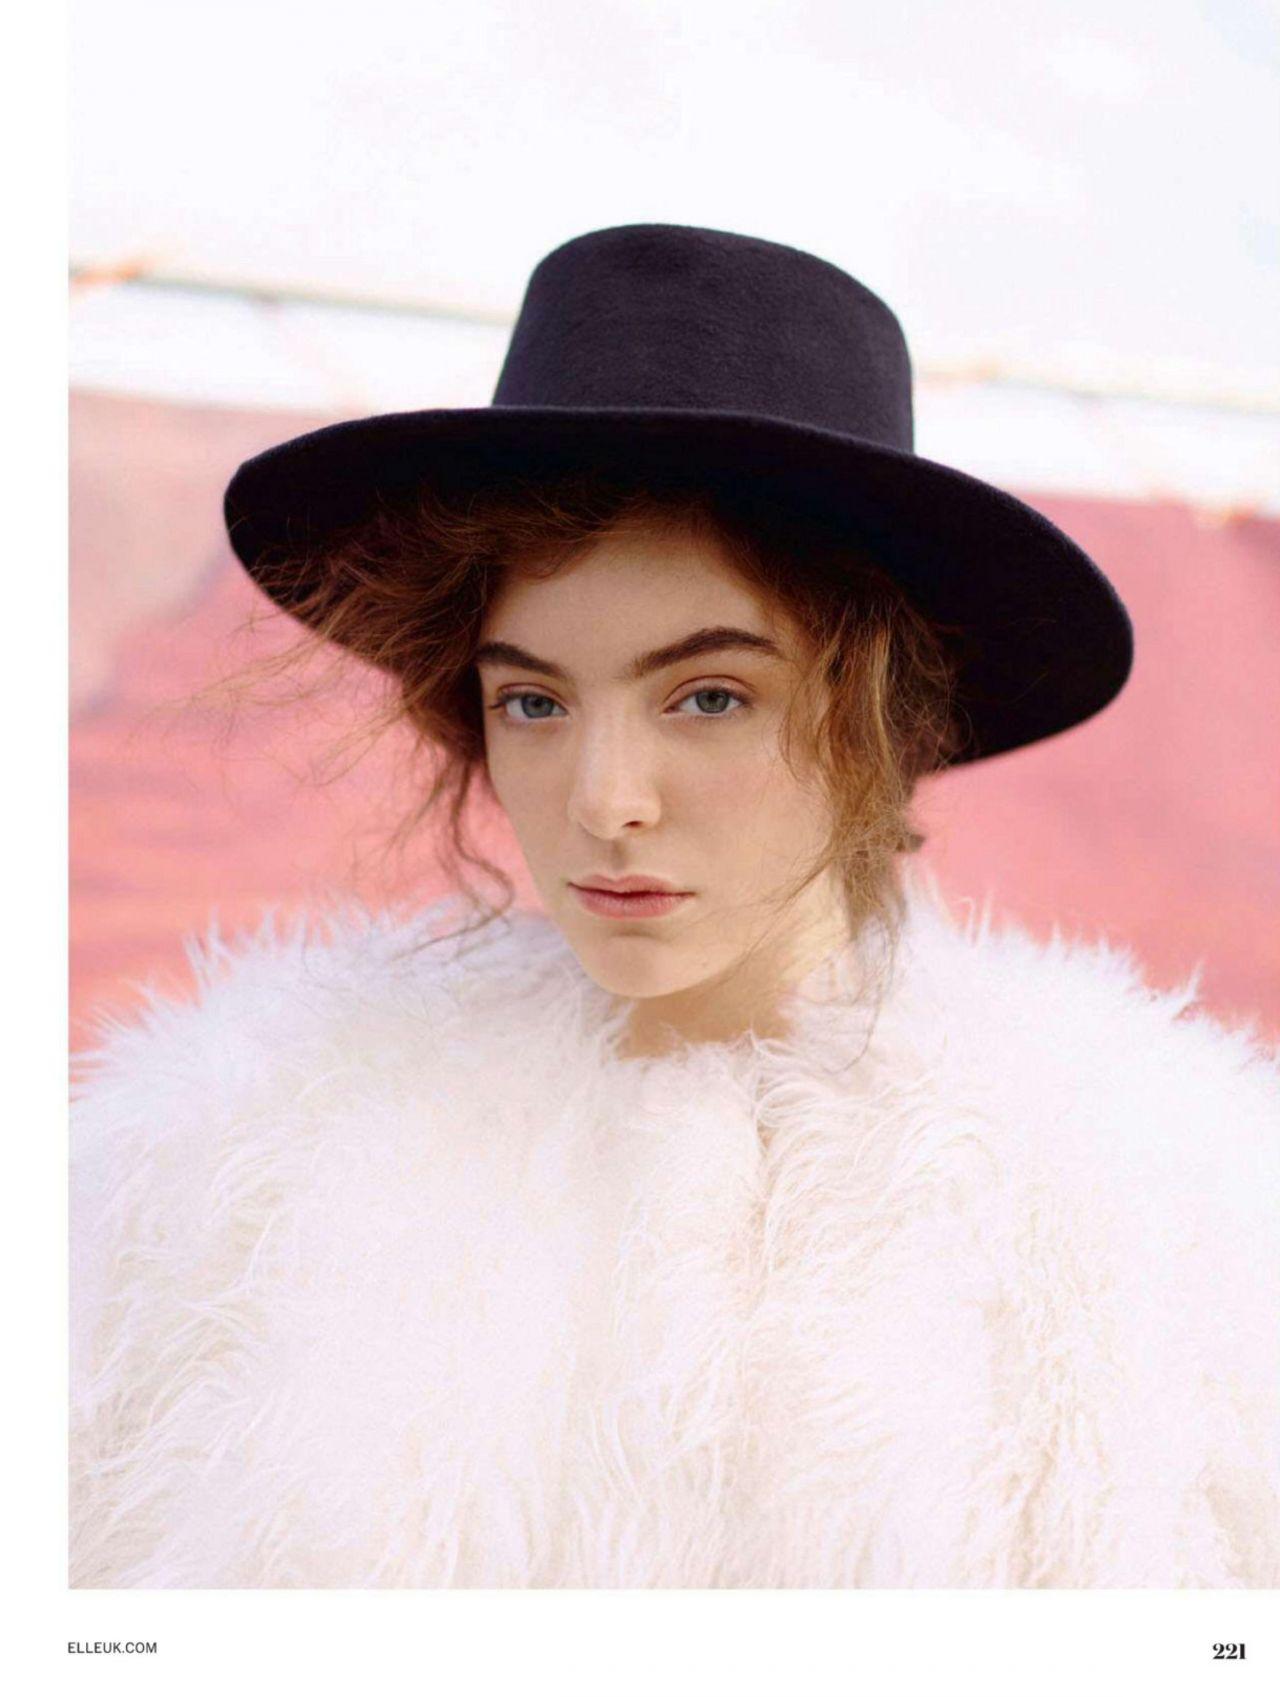 Celeb Photos: Lorde ELLE UK March 2015 - Classic ATRL Lorde Photoshoot 2013